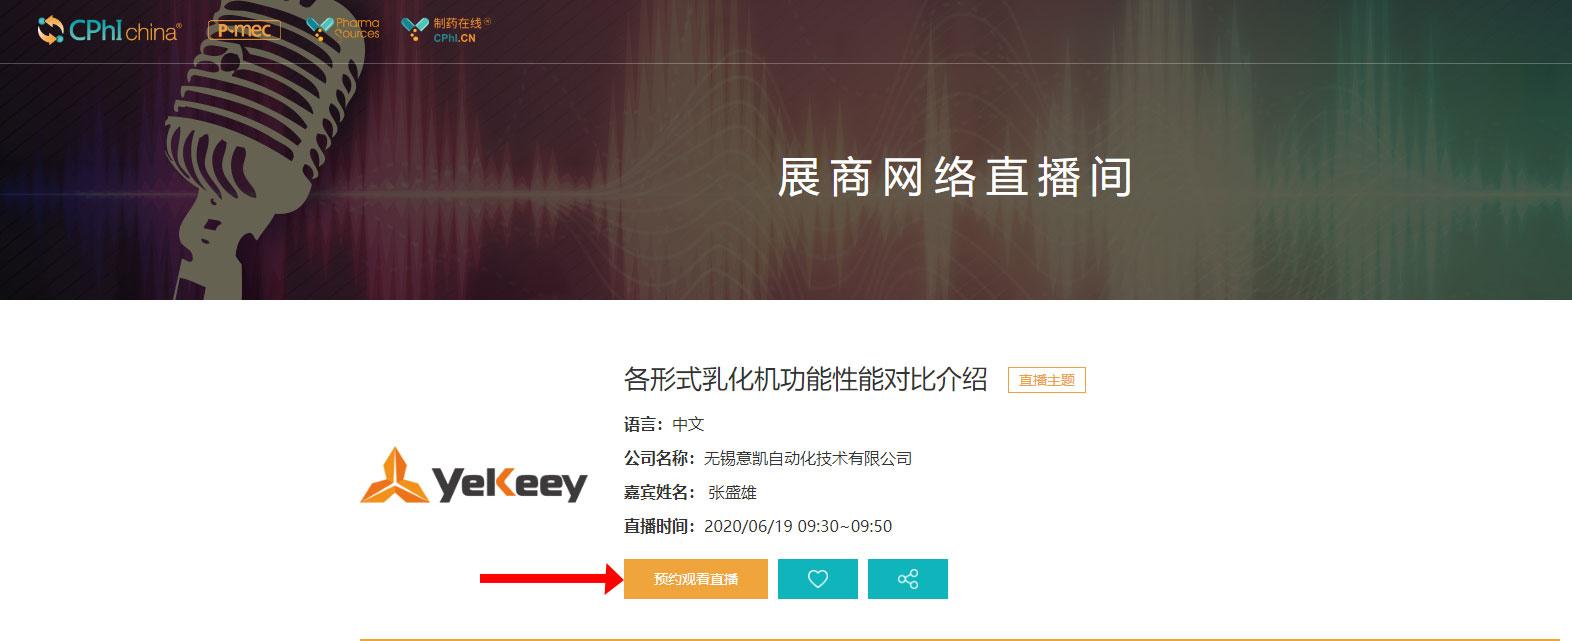 CPhI-&-P-MEC-China线上展会-云高峰论坛-展商网络直播间